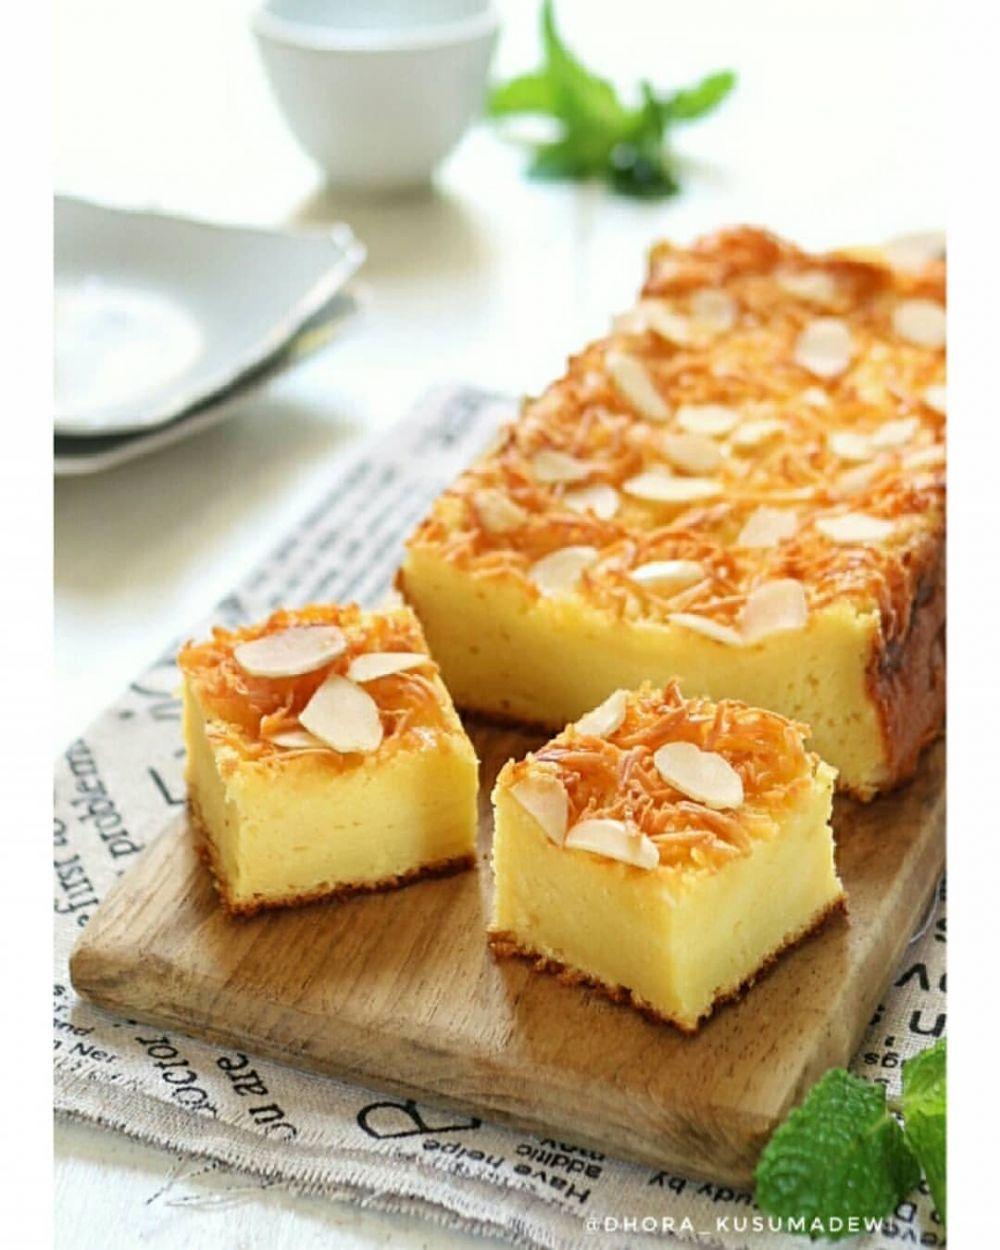 Kue Tanpa Mixer Oven Instagram Resep Kue Makanan Dan Minuman Makanan Ringan Manis